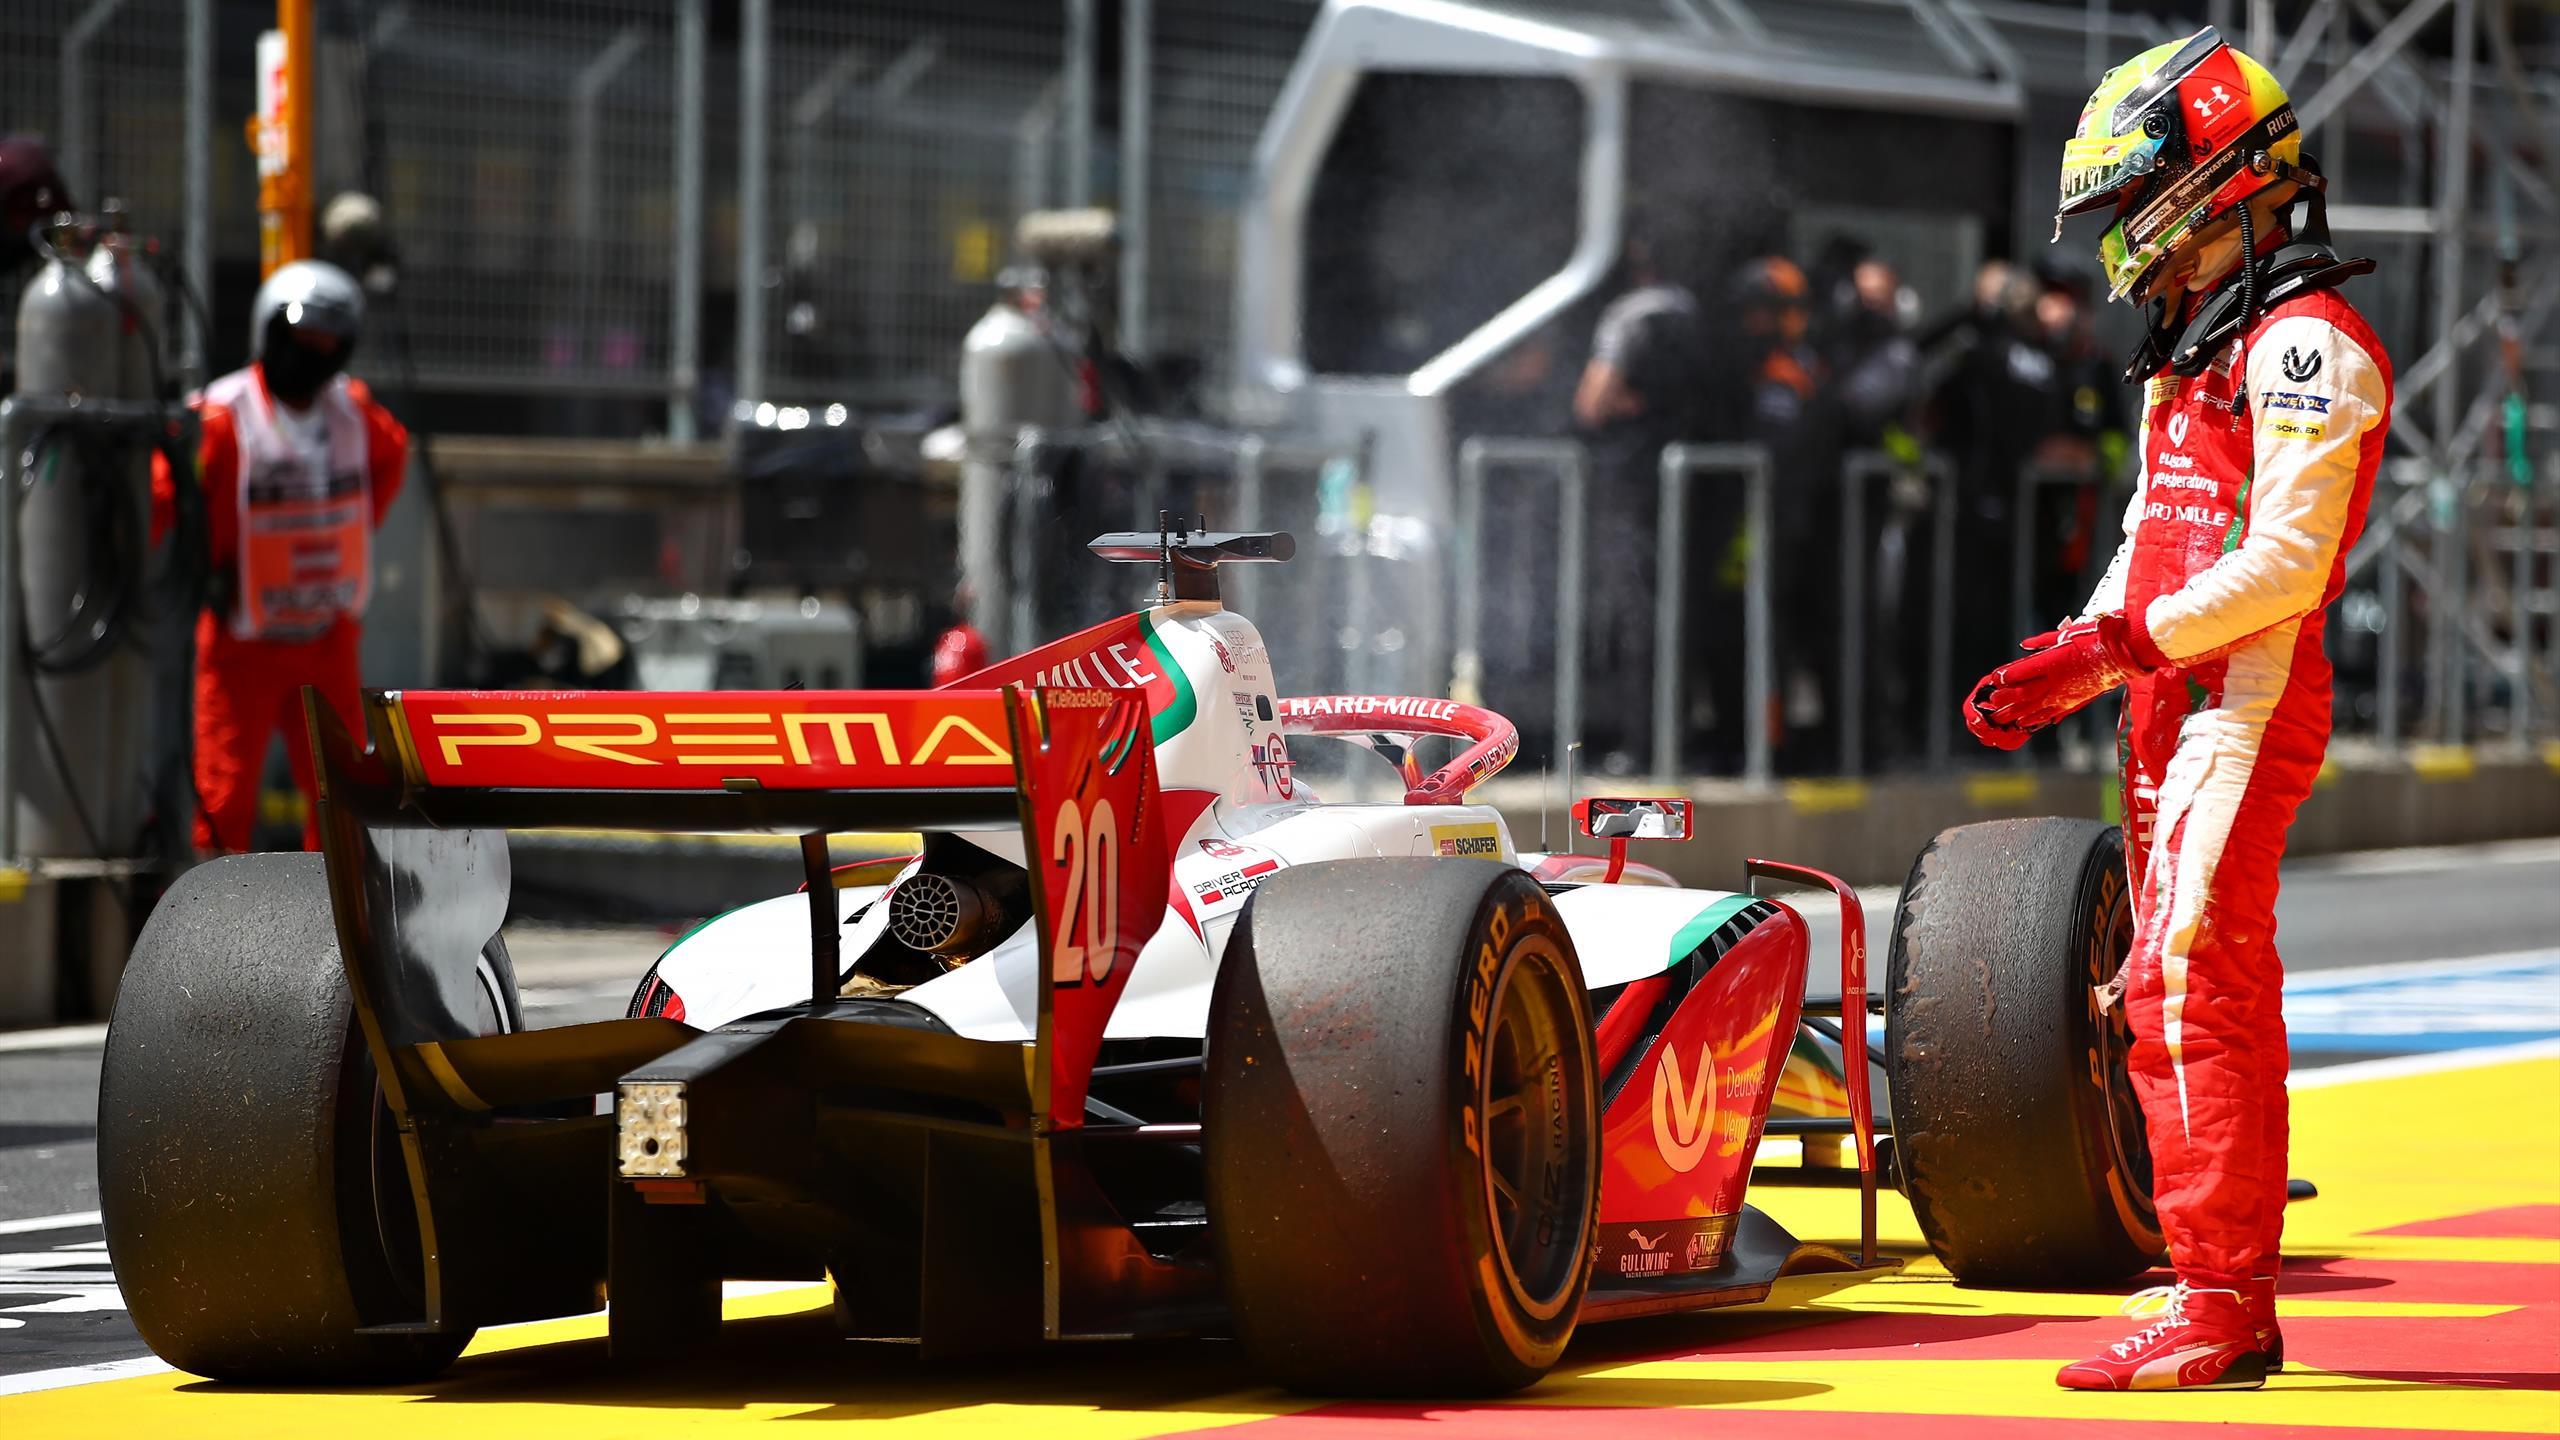 Mick Schumacher Loses Podium After Fire Extinguisher Goes Off In Cockpit Eurosport